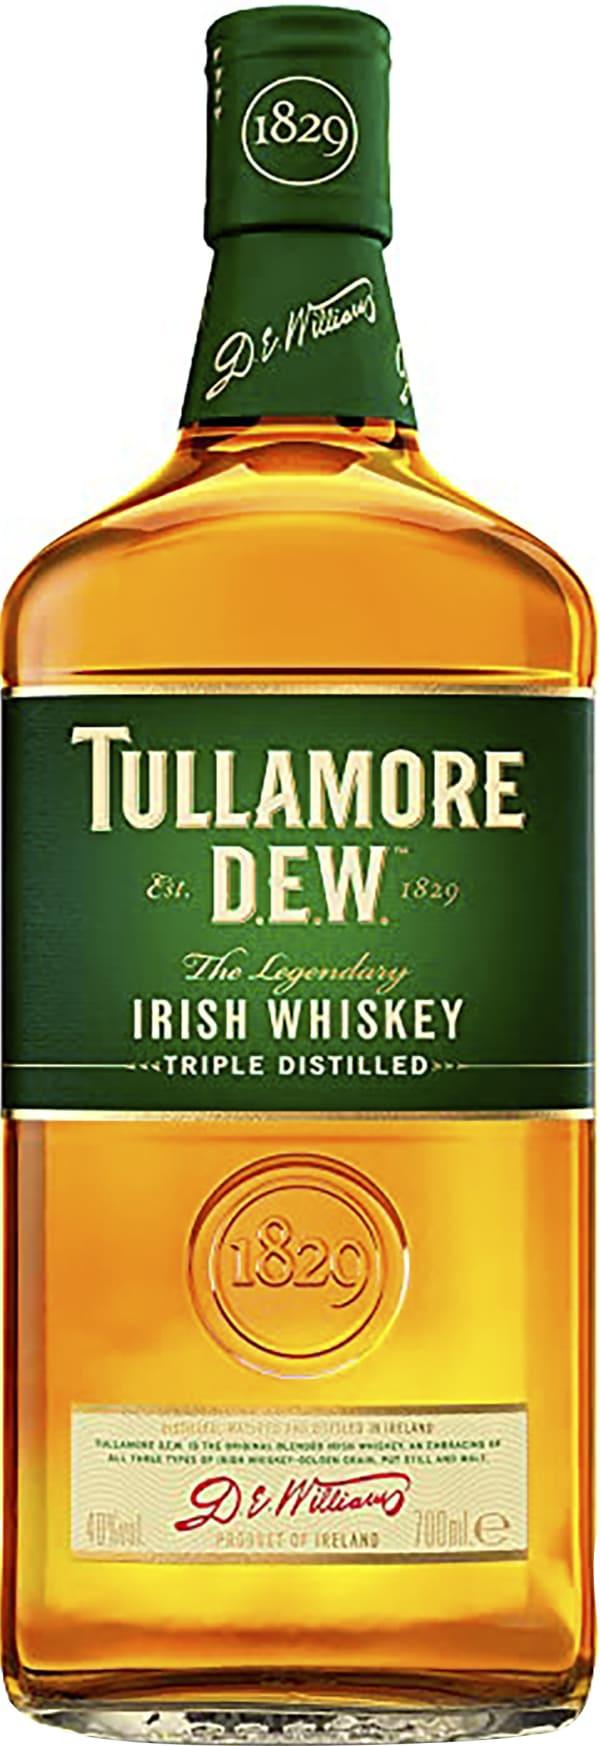 Tullamore D.E.W